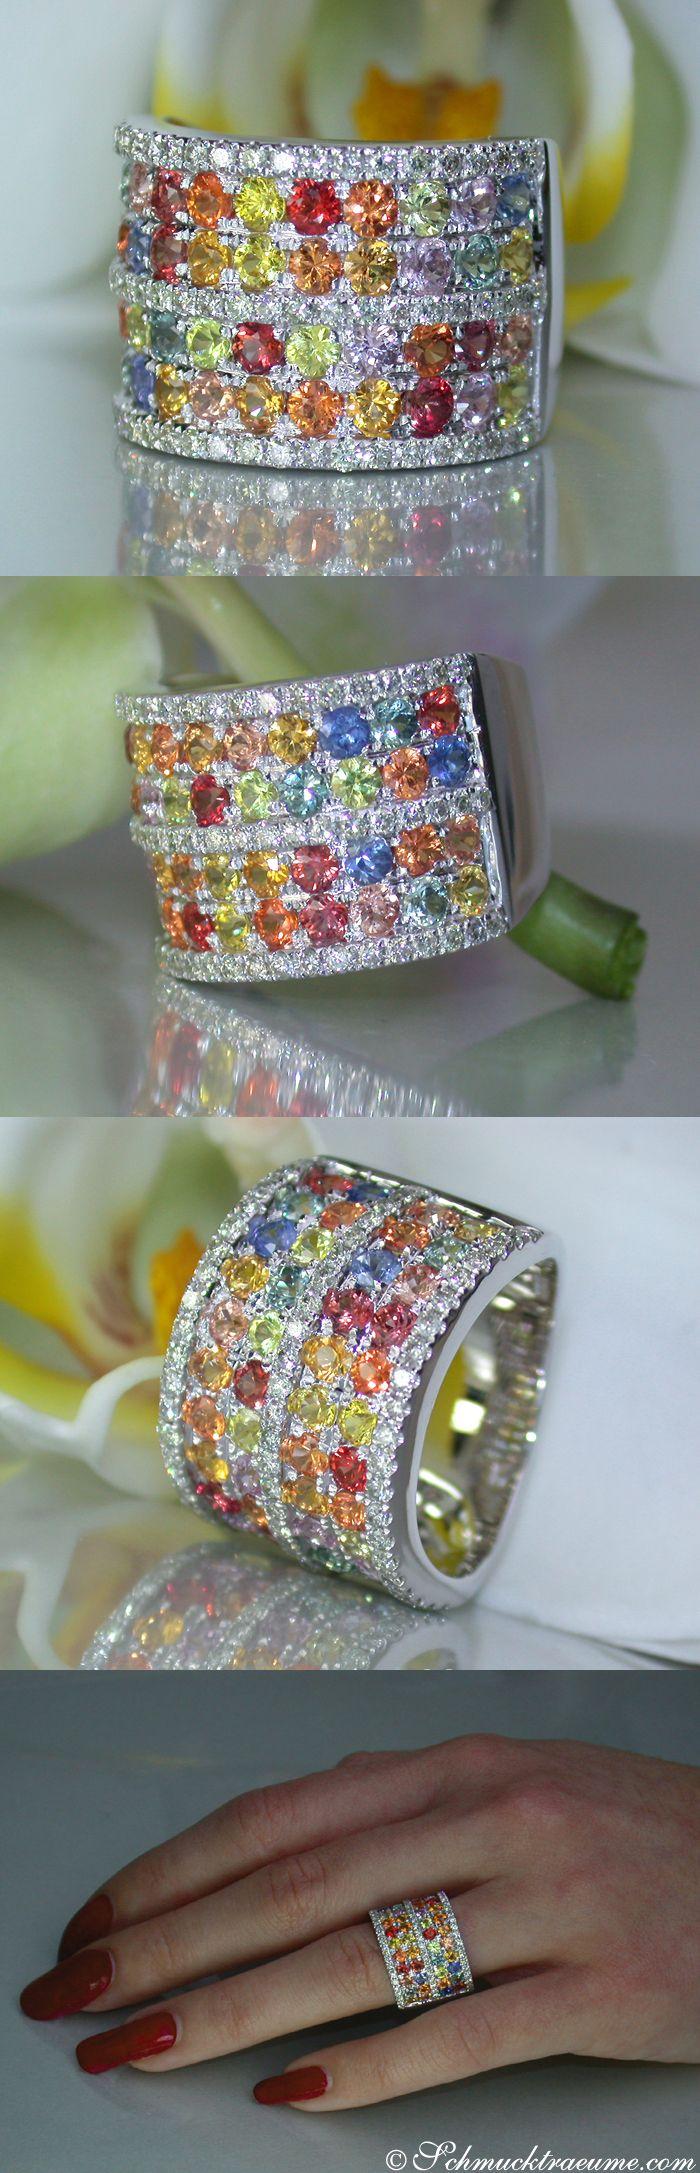 Beautiful Multicolor Sapphire Diamond Ring, 3,48 cts. WG14K - Visit: schmucktraeume.com - Like: https://www.facebook.com/pages/Noble-Juwelen/150871984924926 - Mail: info@schmucktraeume.com